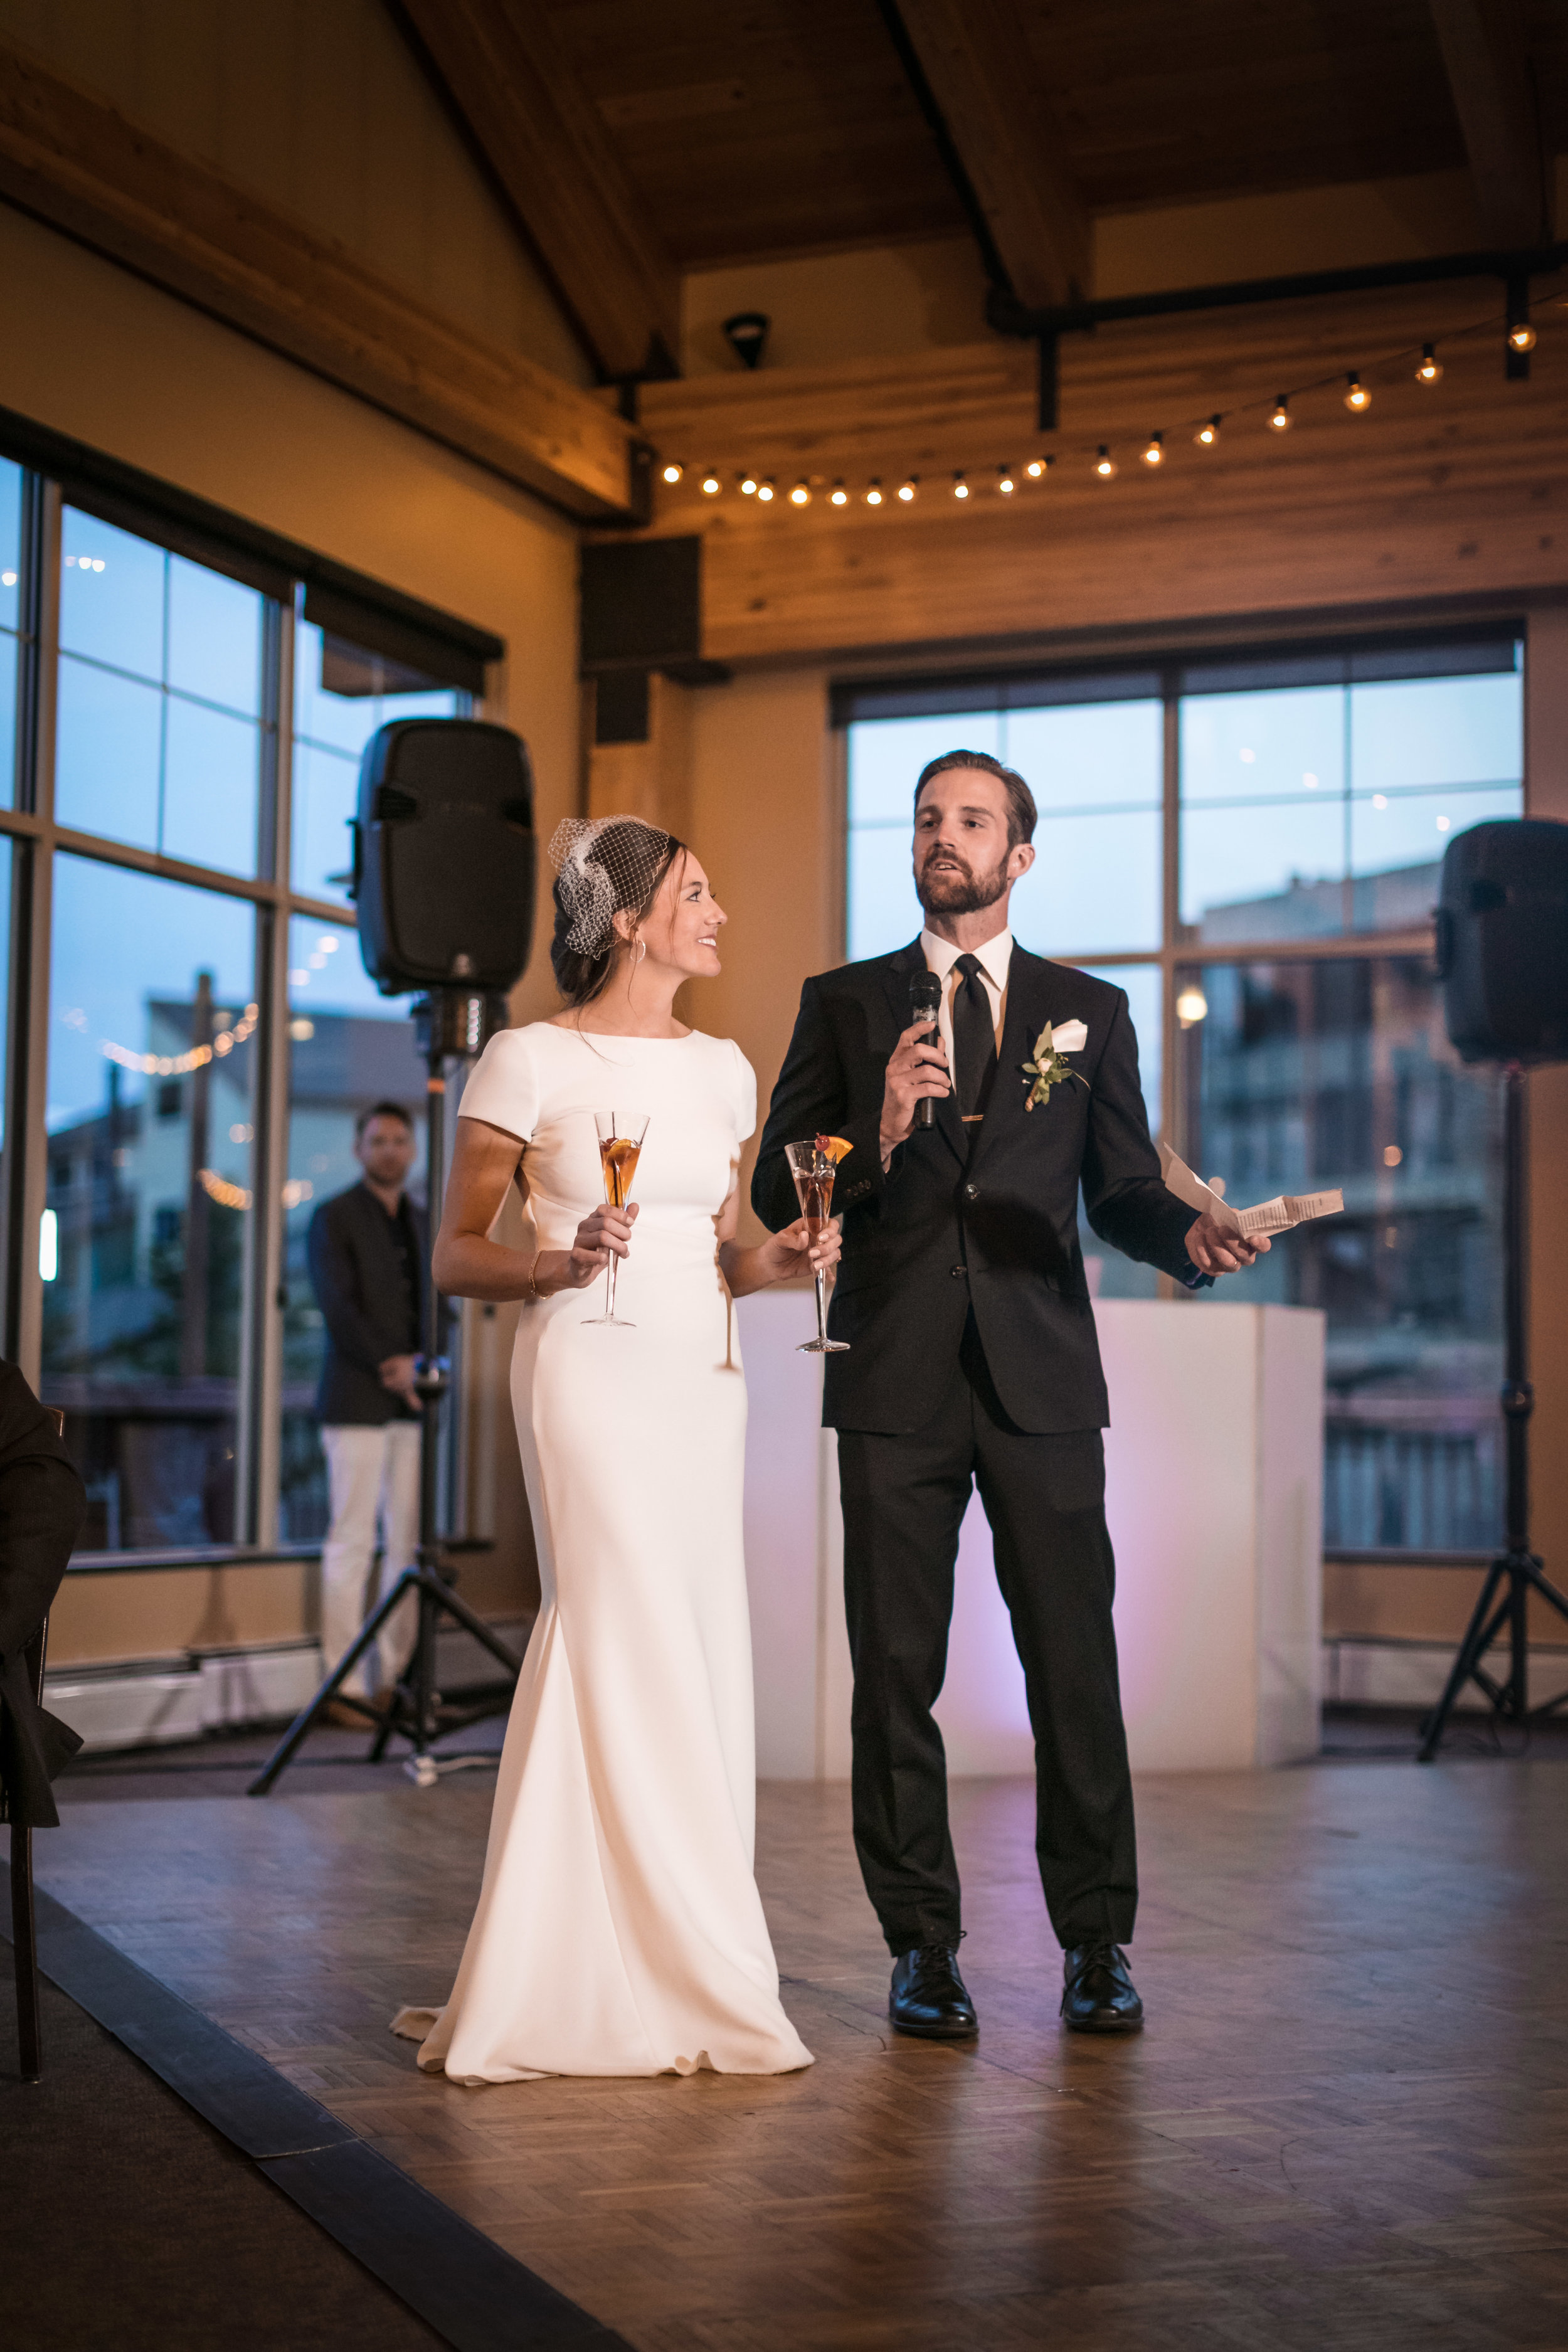 vild-photography-photographer-colorado-intimate-wedding-adventure-Stephanie- Adam-569.jpg